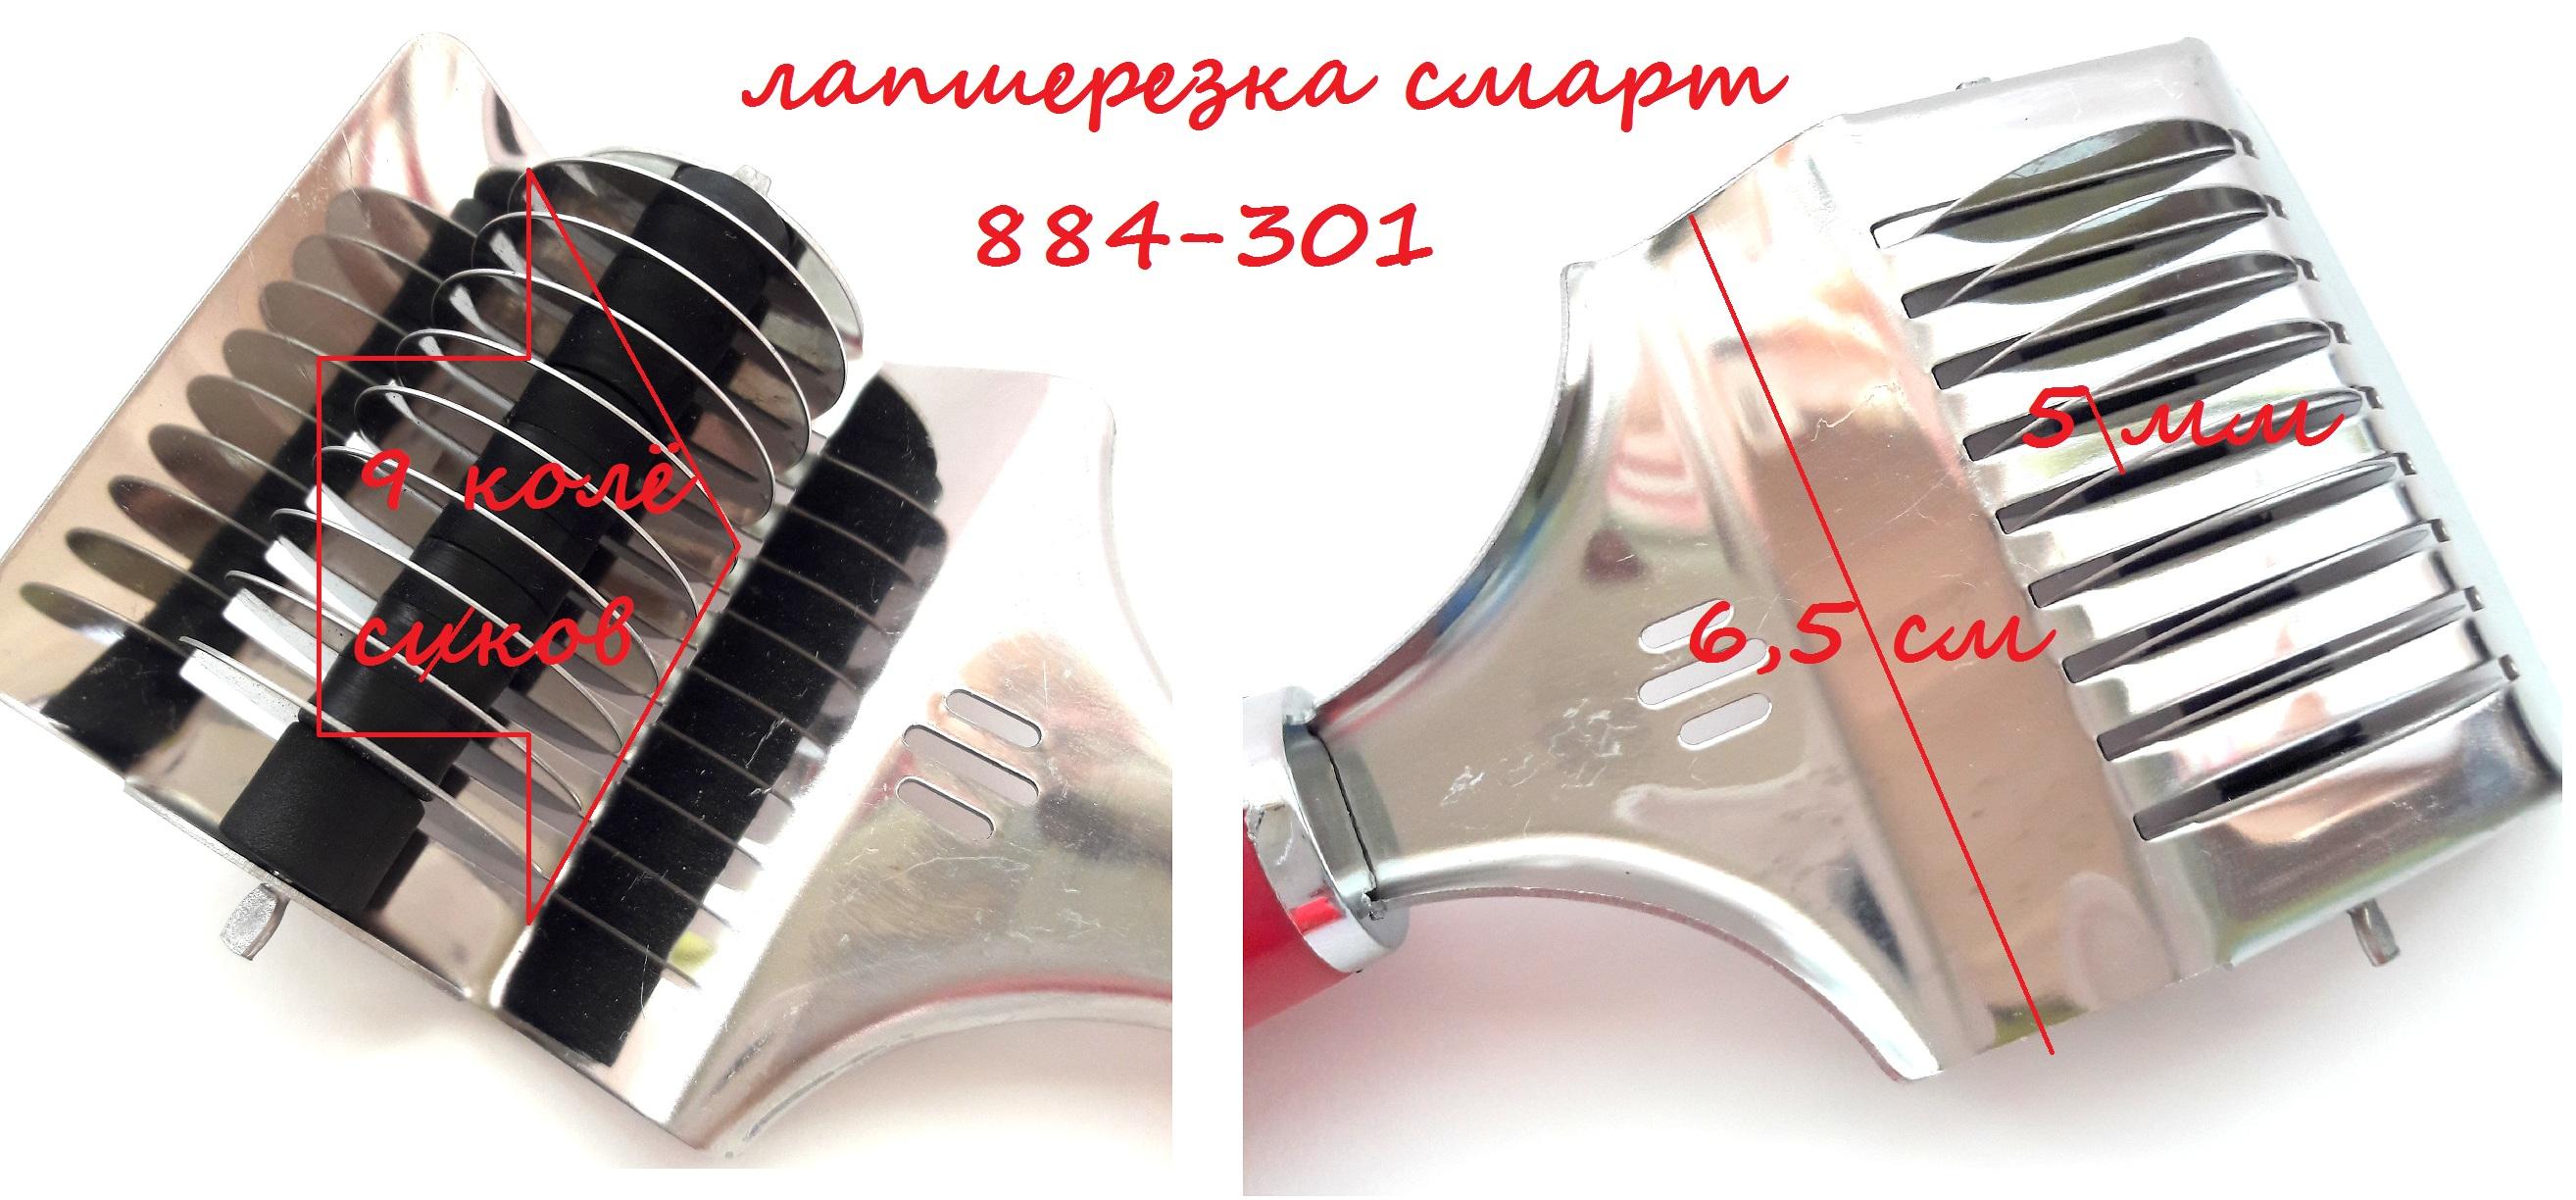 VETTA 884-301 Ролик лапшерезка